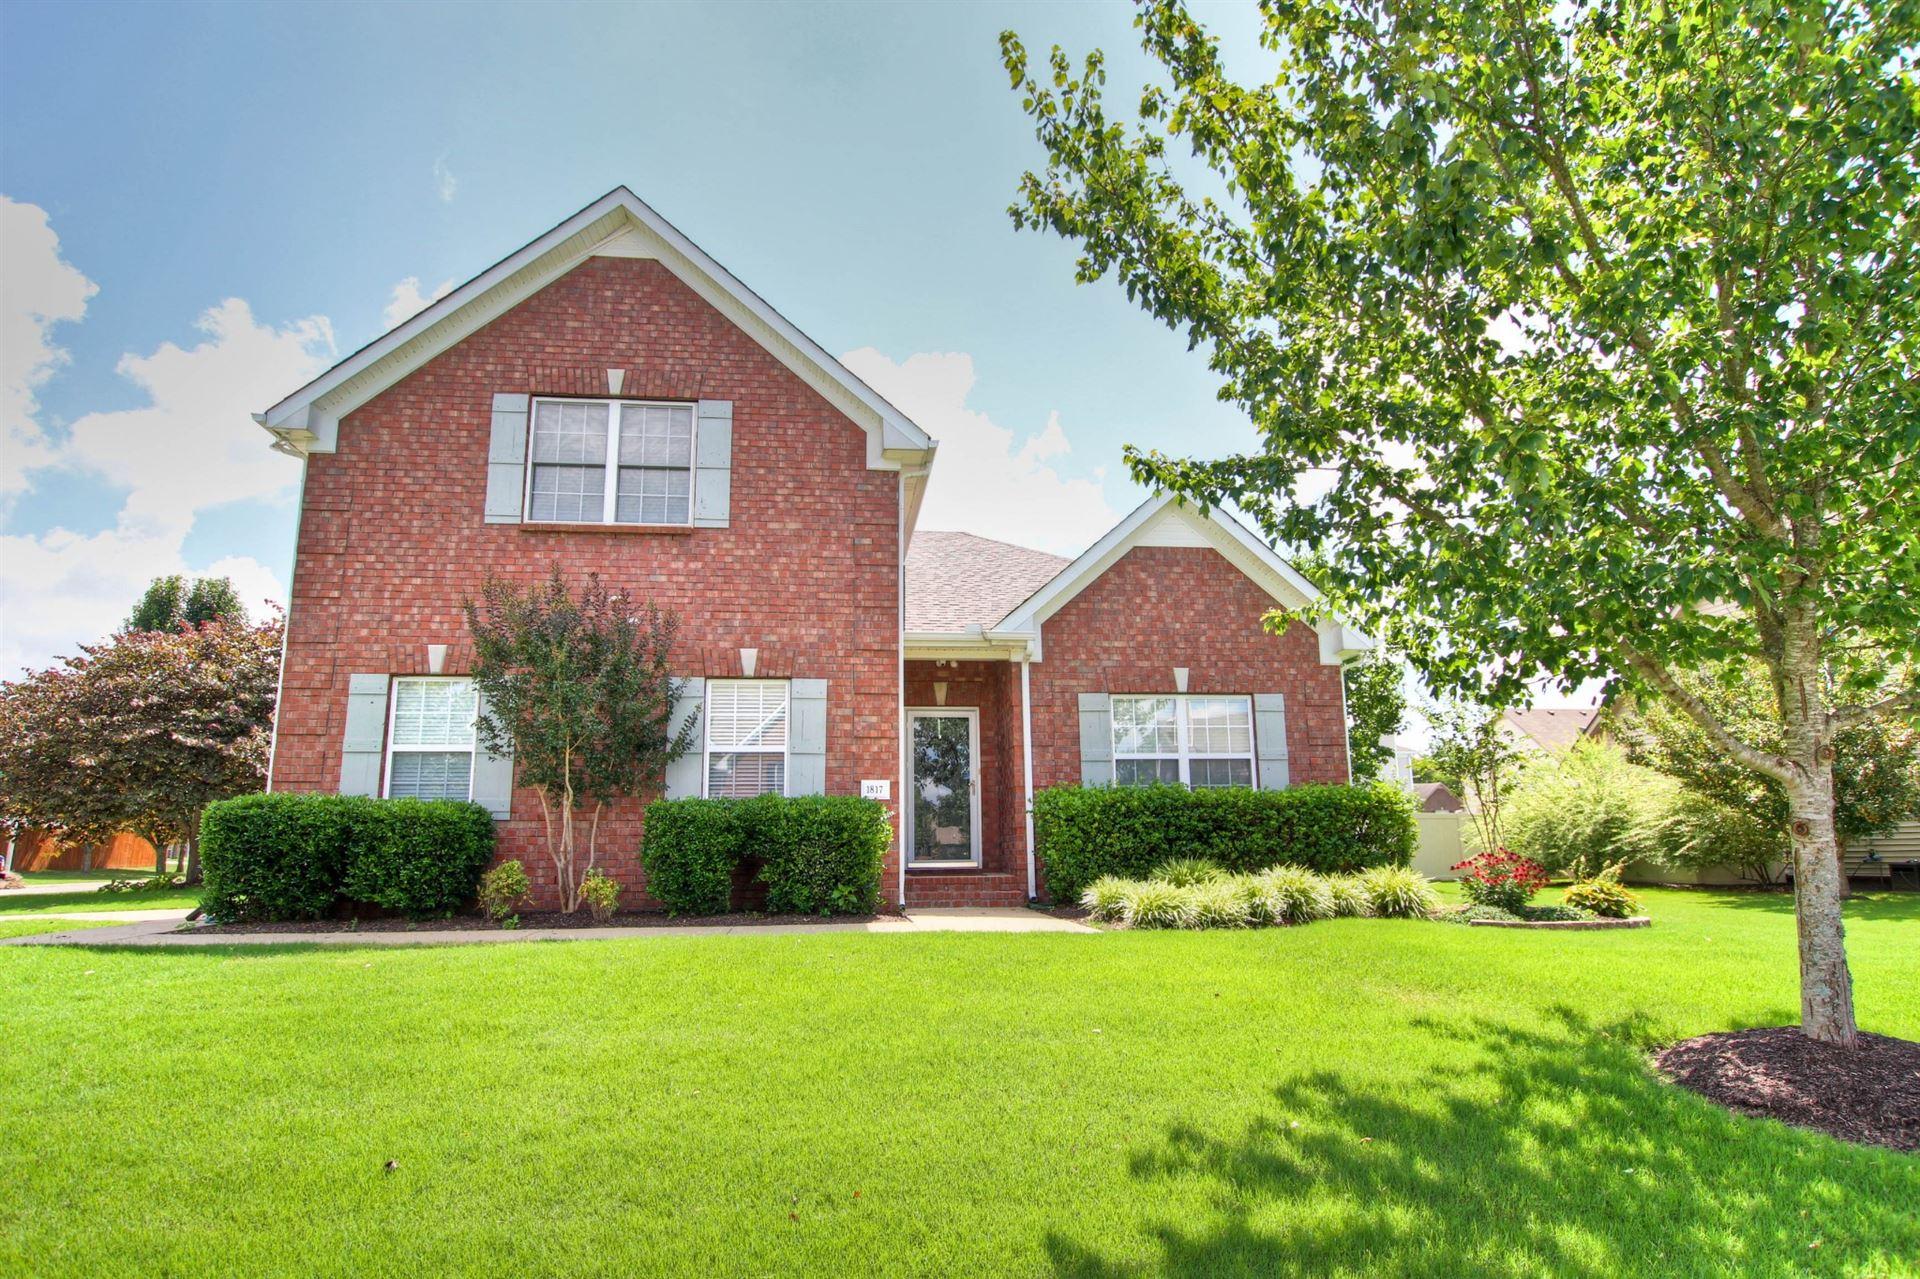 Photo of 1817 Kinsale Ave, Murfreesboro, TN 37128 (MLS # 2168140)